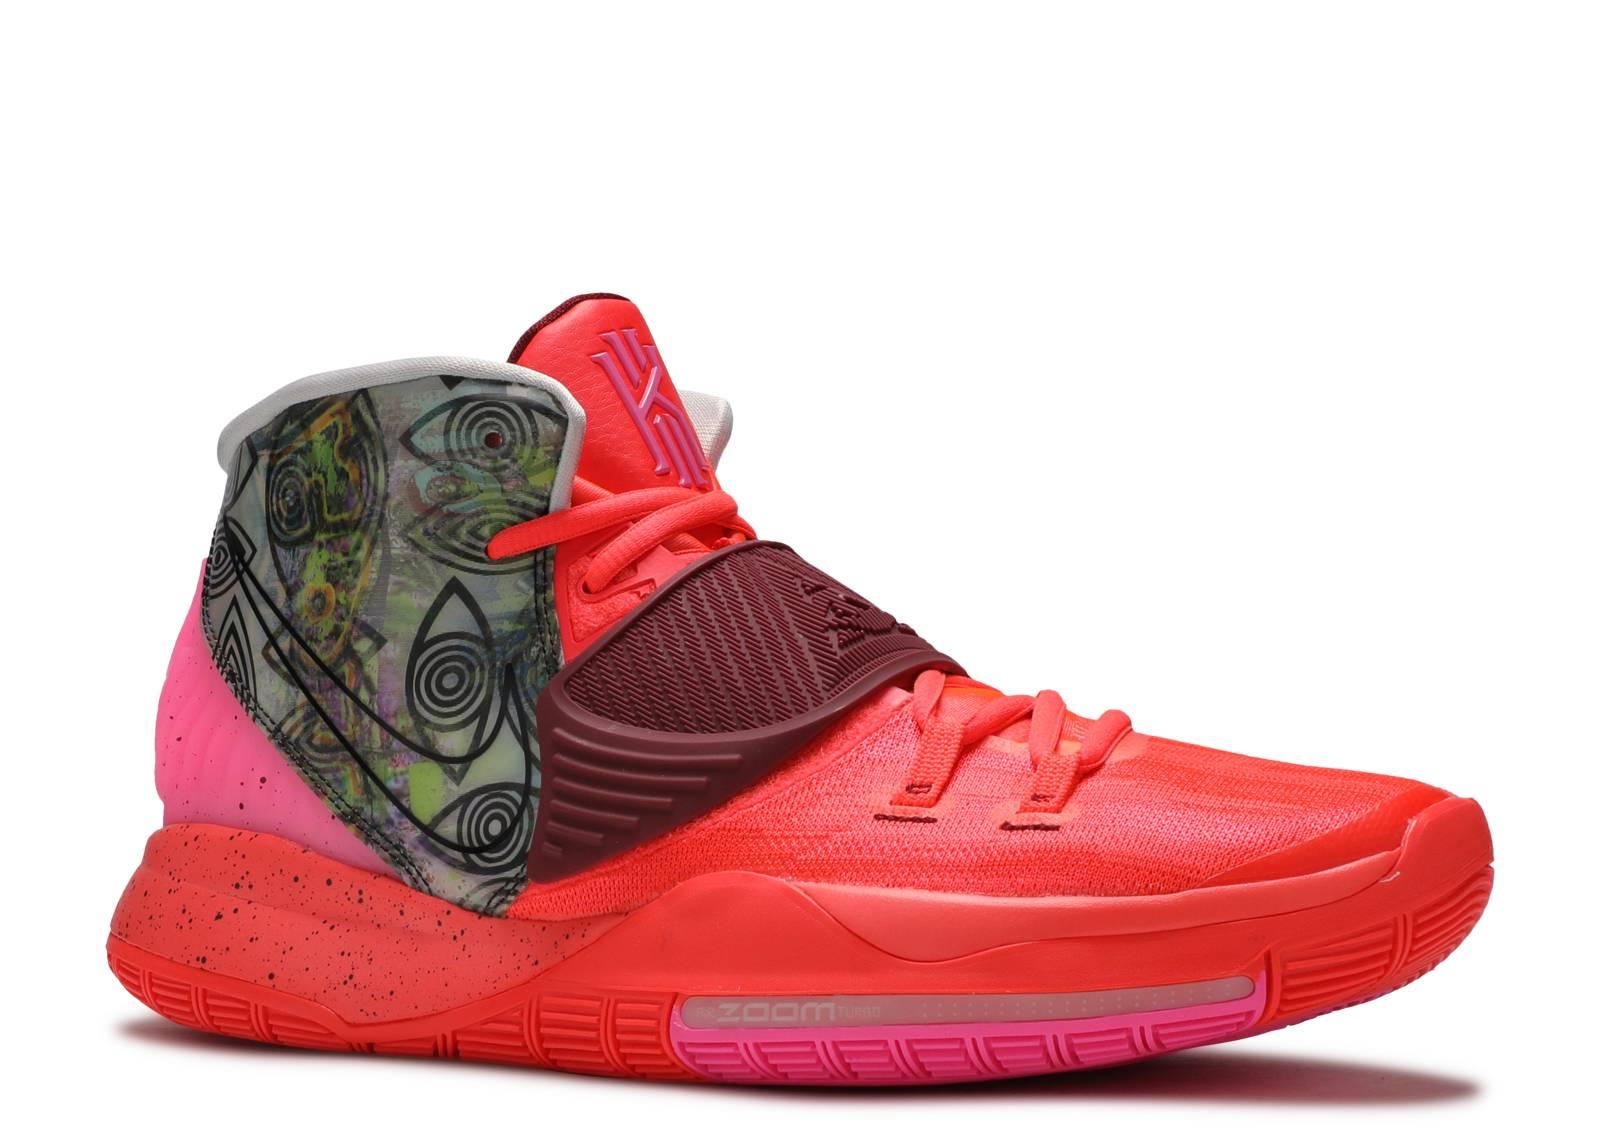 Cheap Kyrie 6, Buy Cheap Nike Kyrie 6 shoes Fake Sale